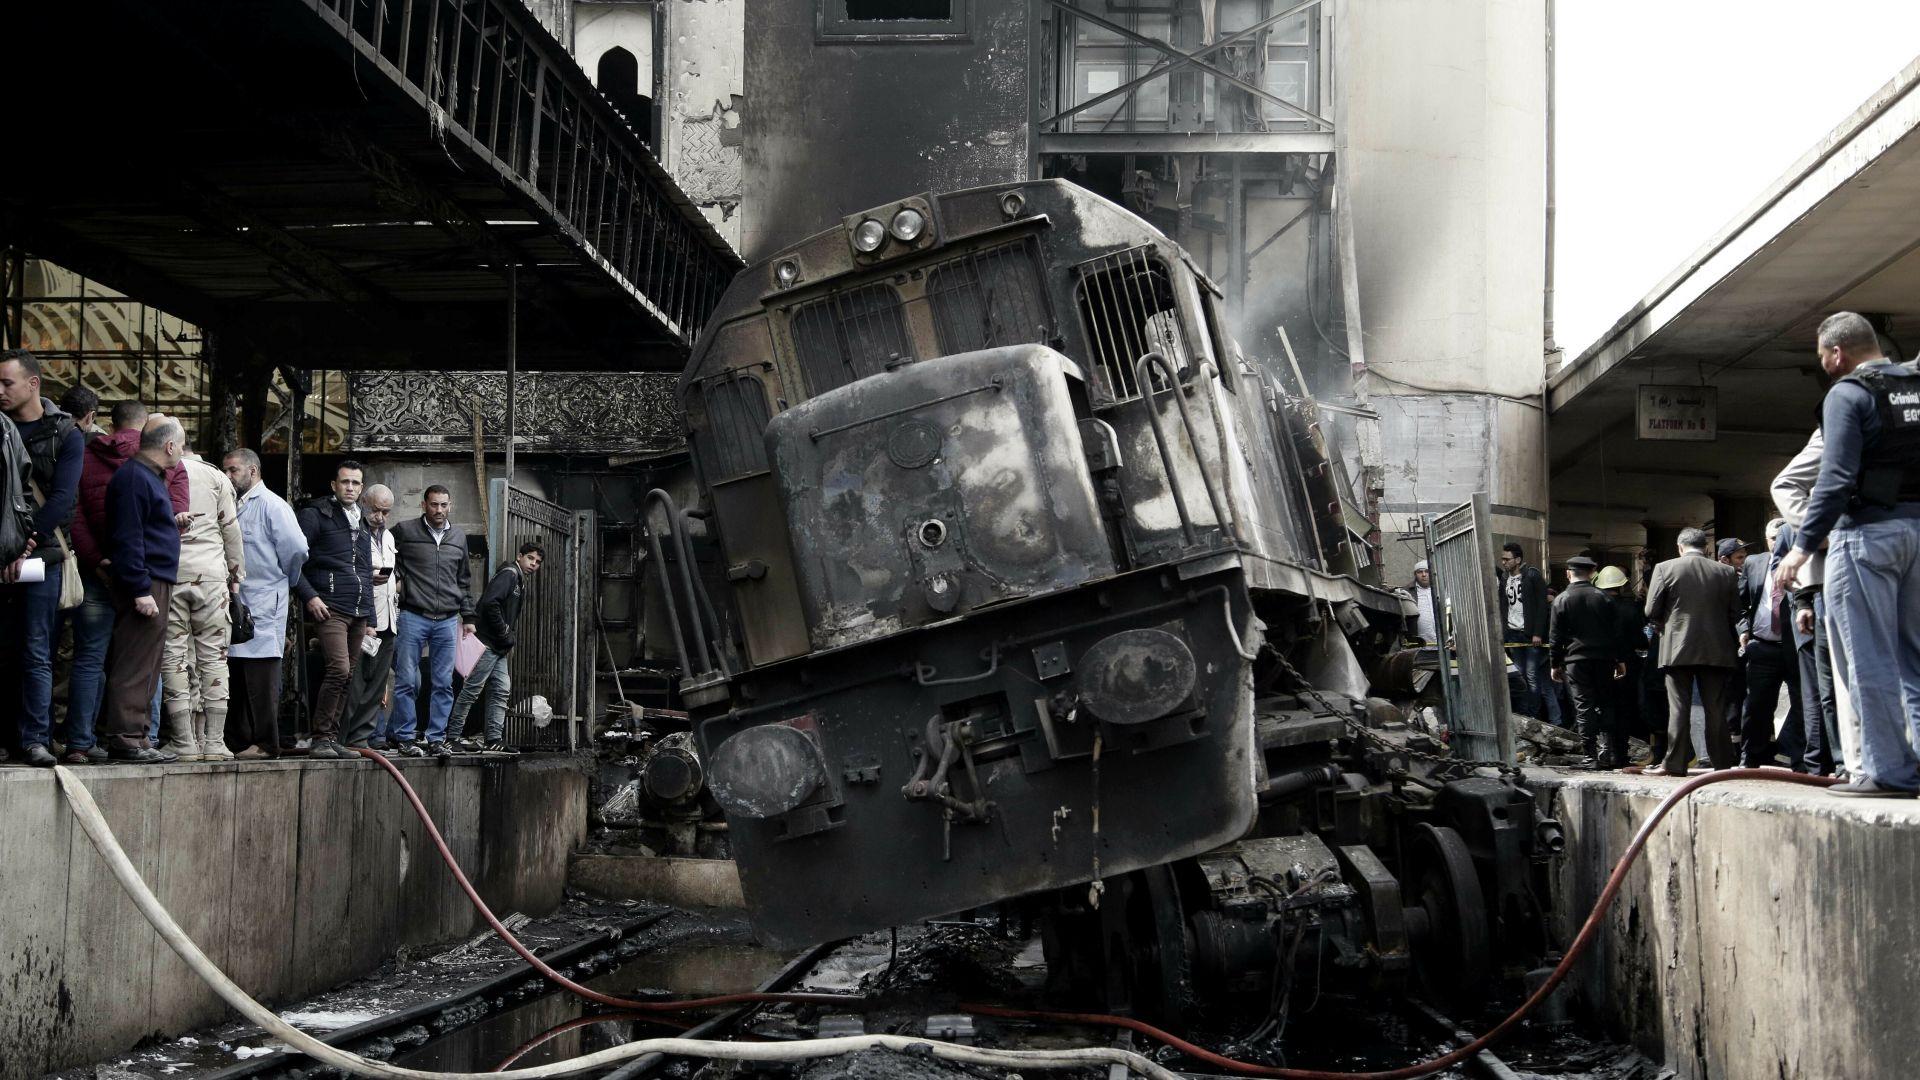 Пожар в Кайро взе 25 жертви: локомотив без машинист се врязал в гарата (видео)